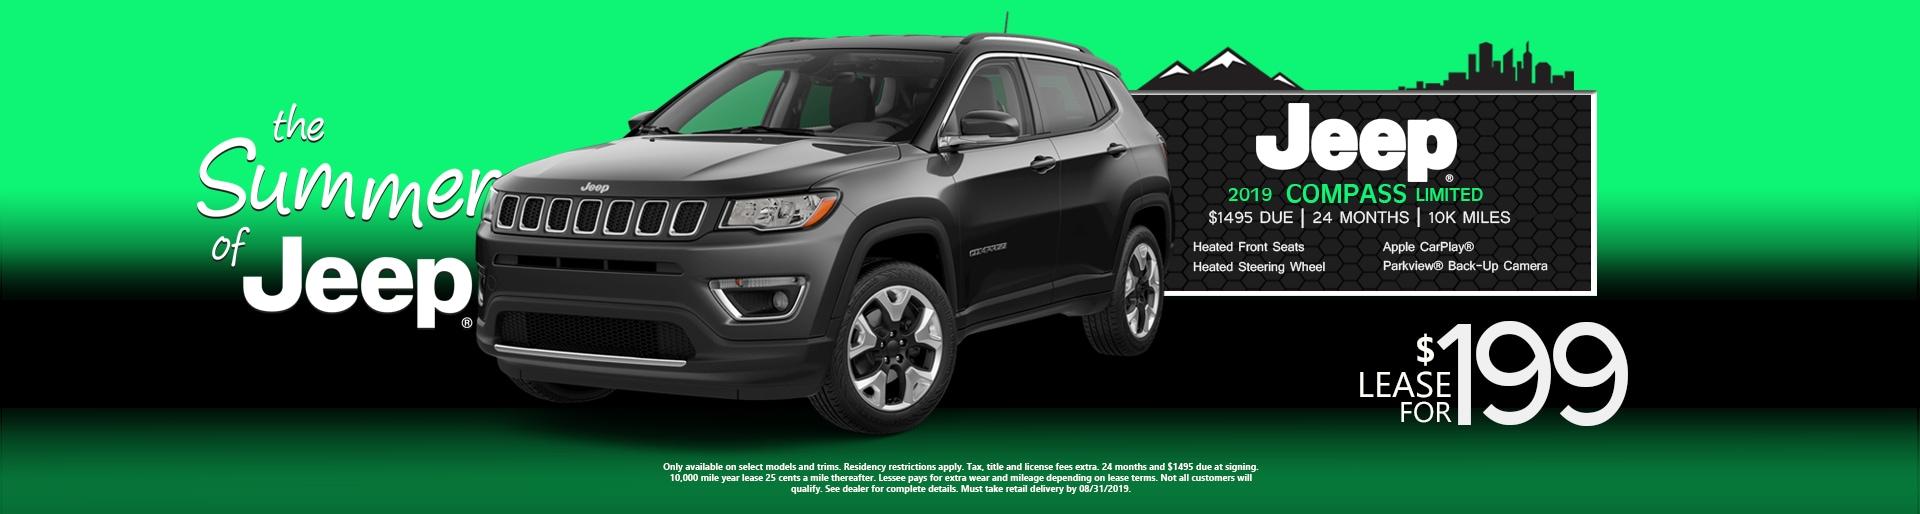 Jeep Dealers Cleveland >> New Chrysler Dodge Jeep Ram Used Car Dealer In Cuyahoga Falls